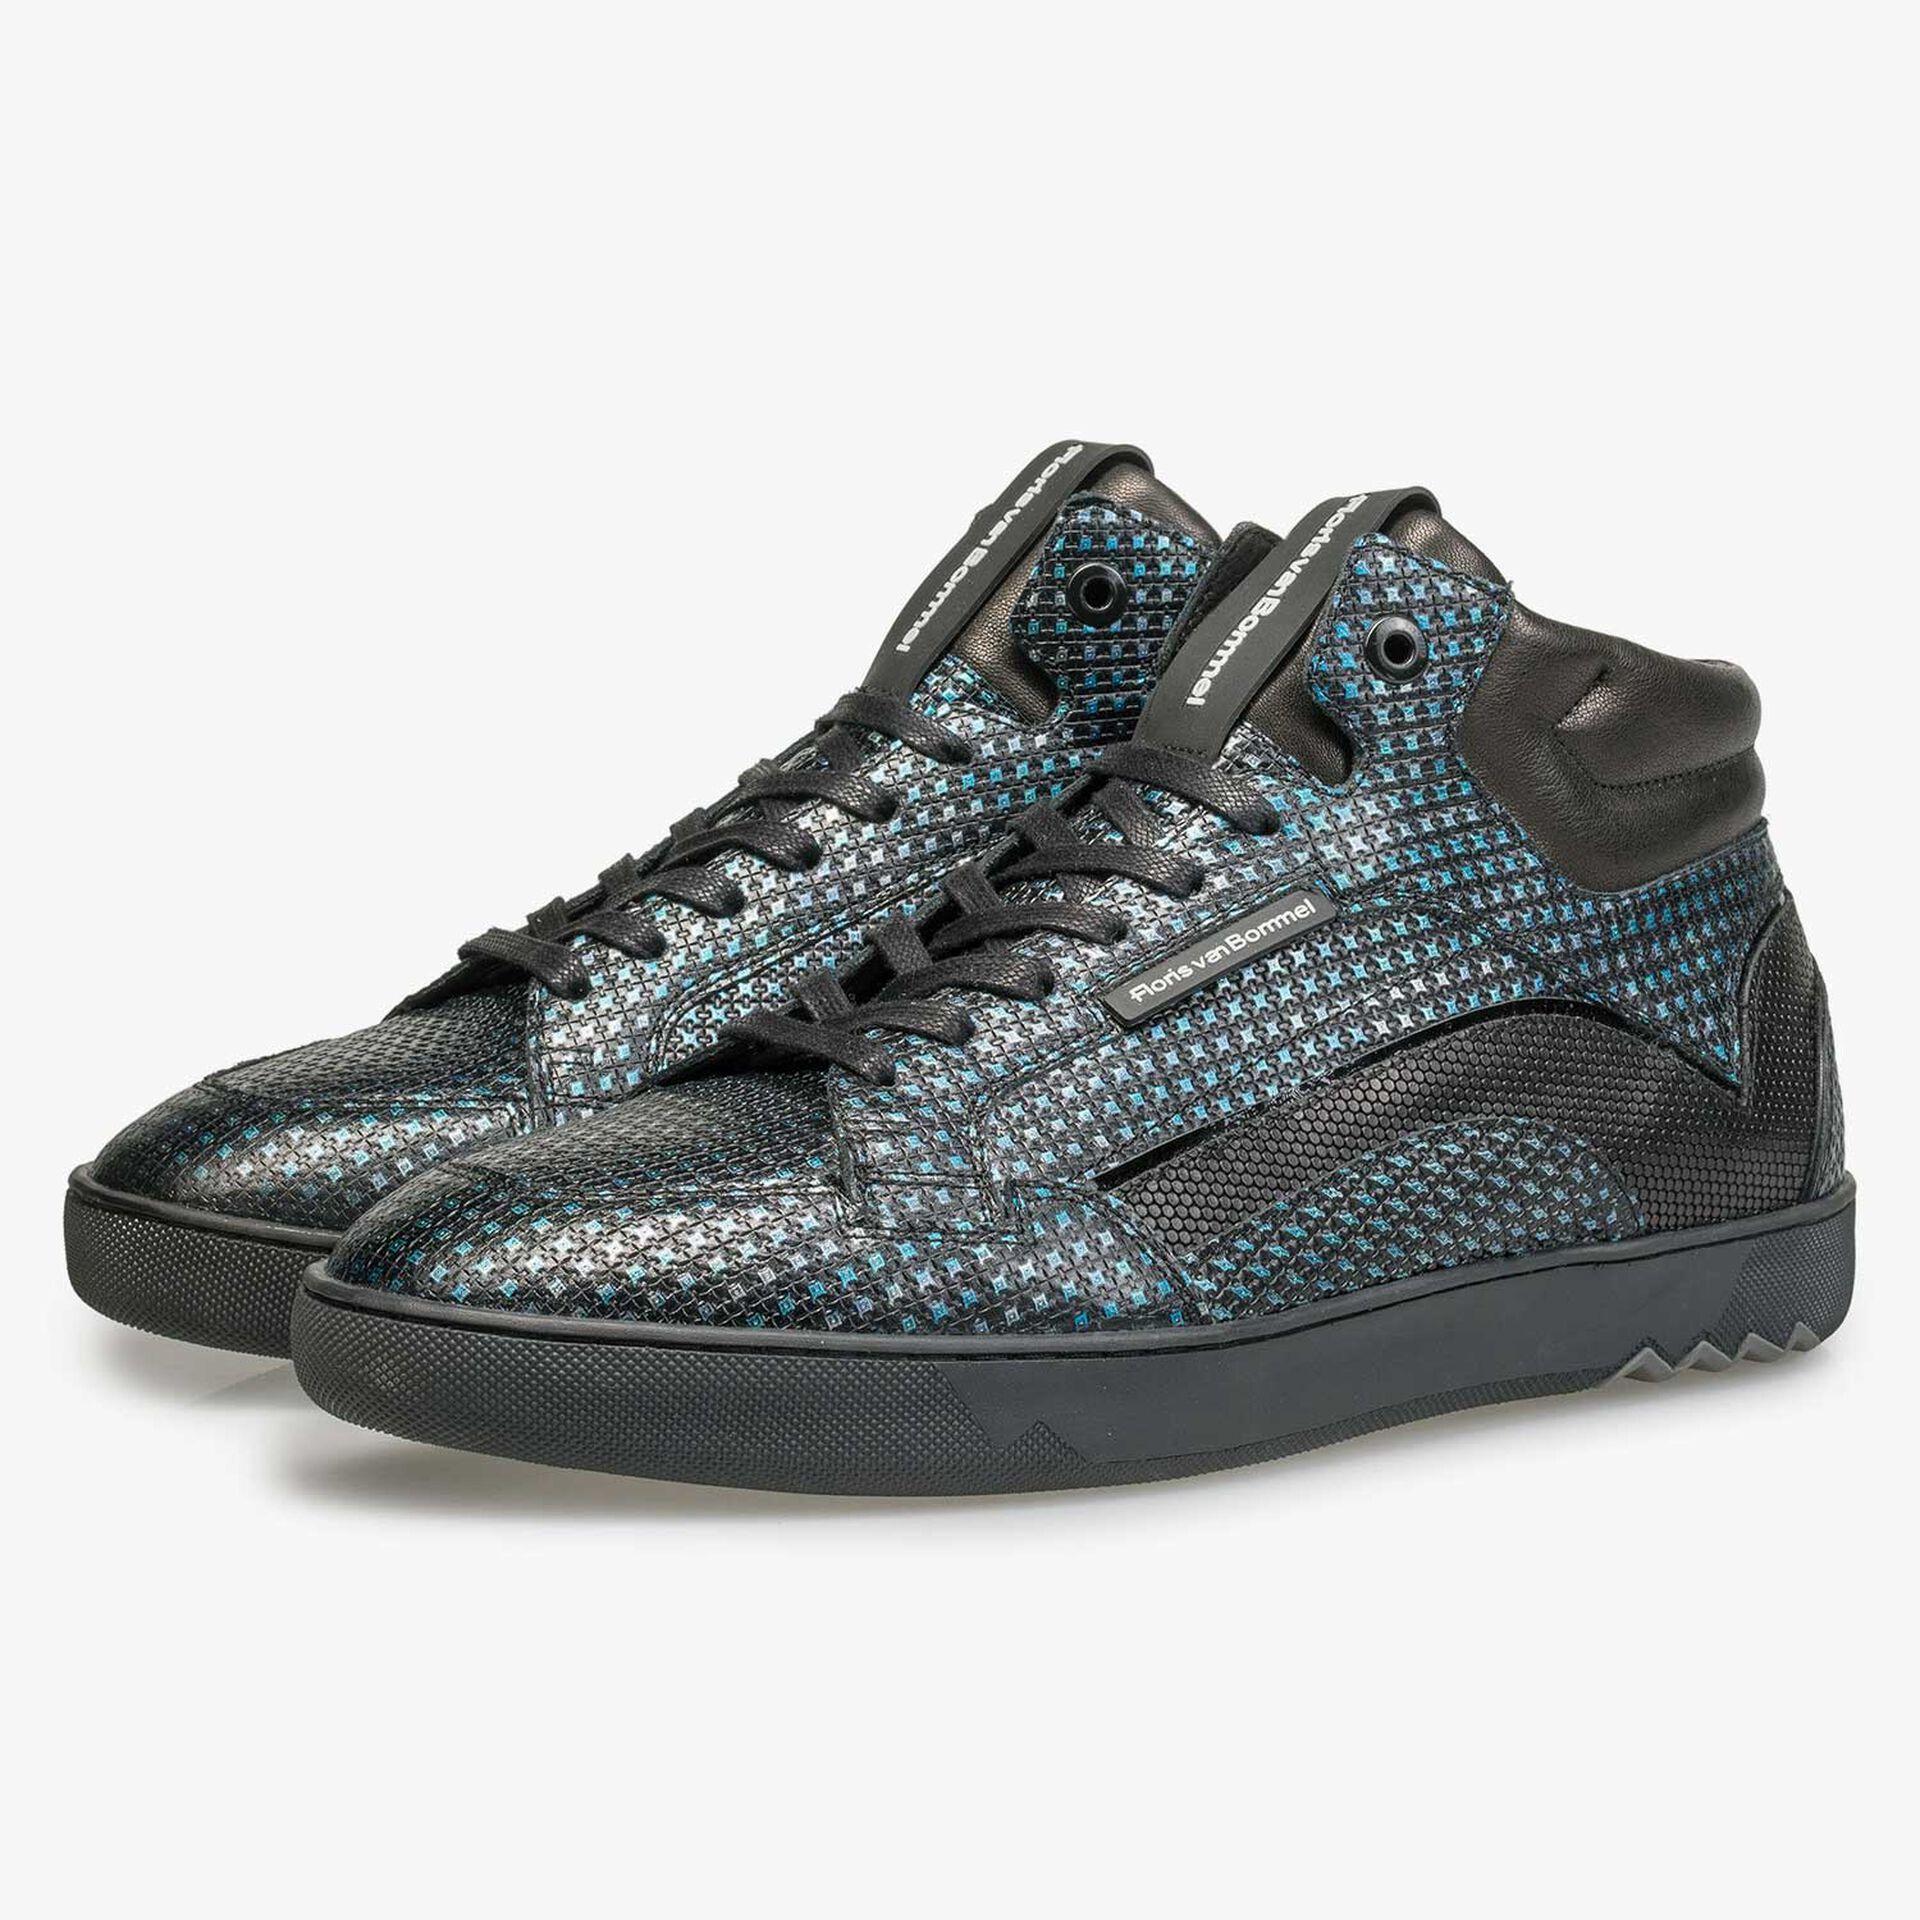 Blue sneaker with metallic print